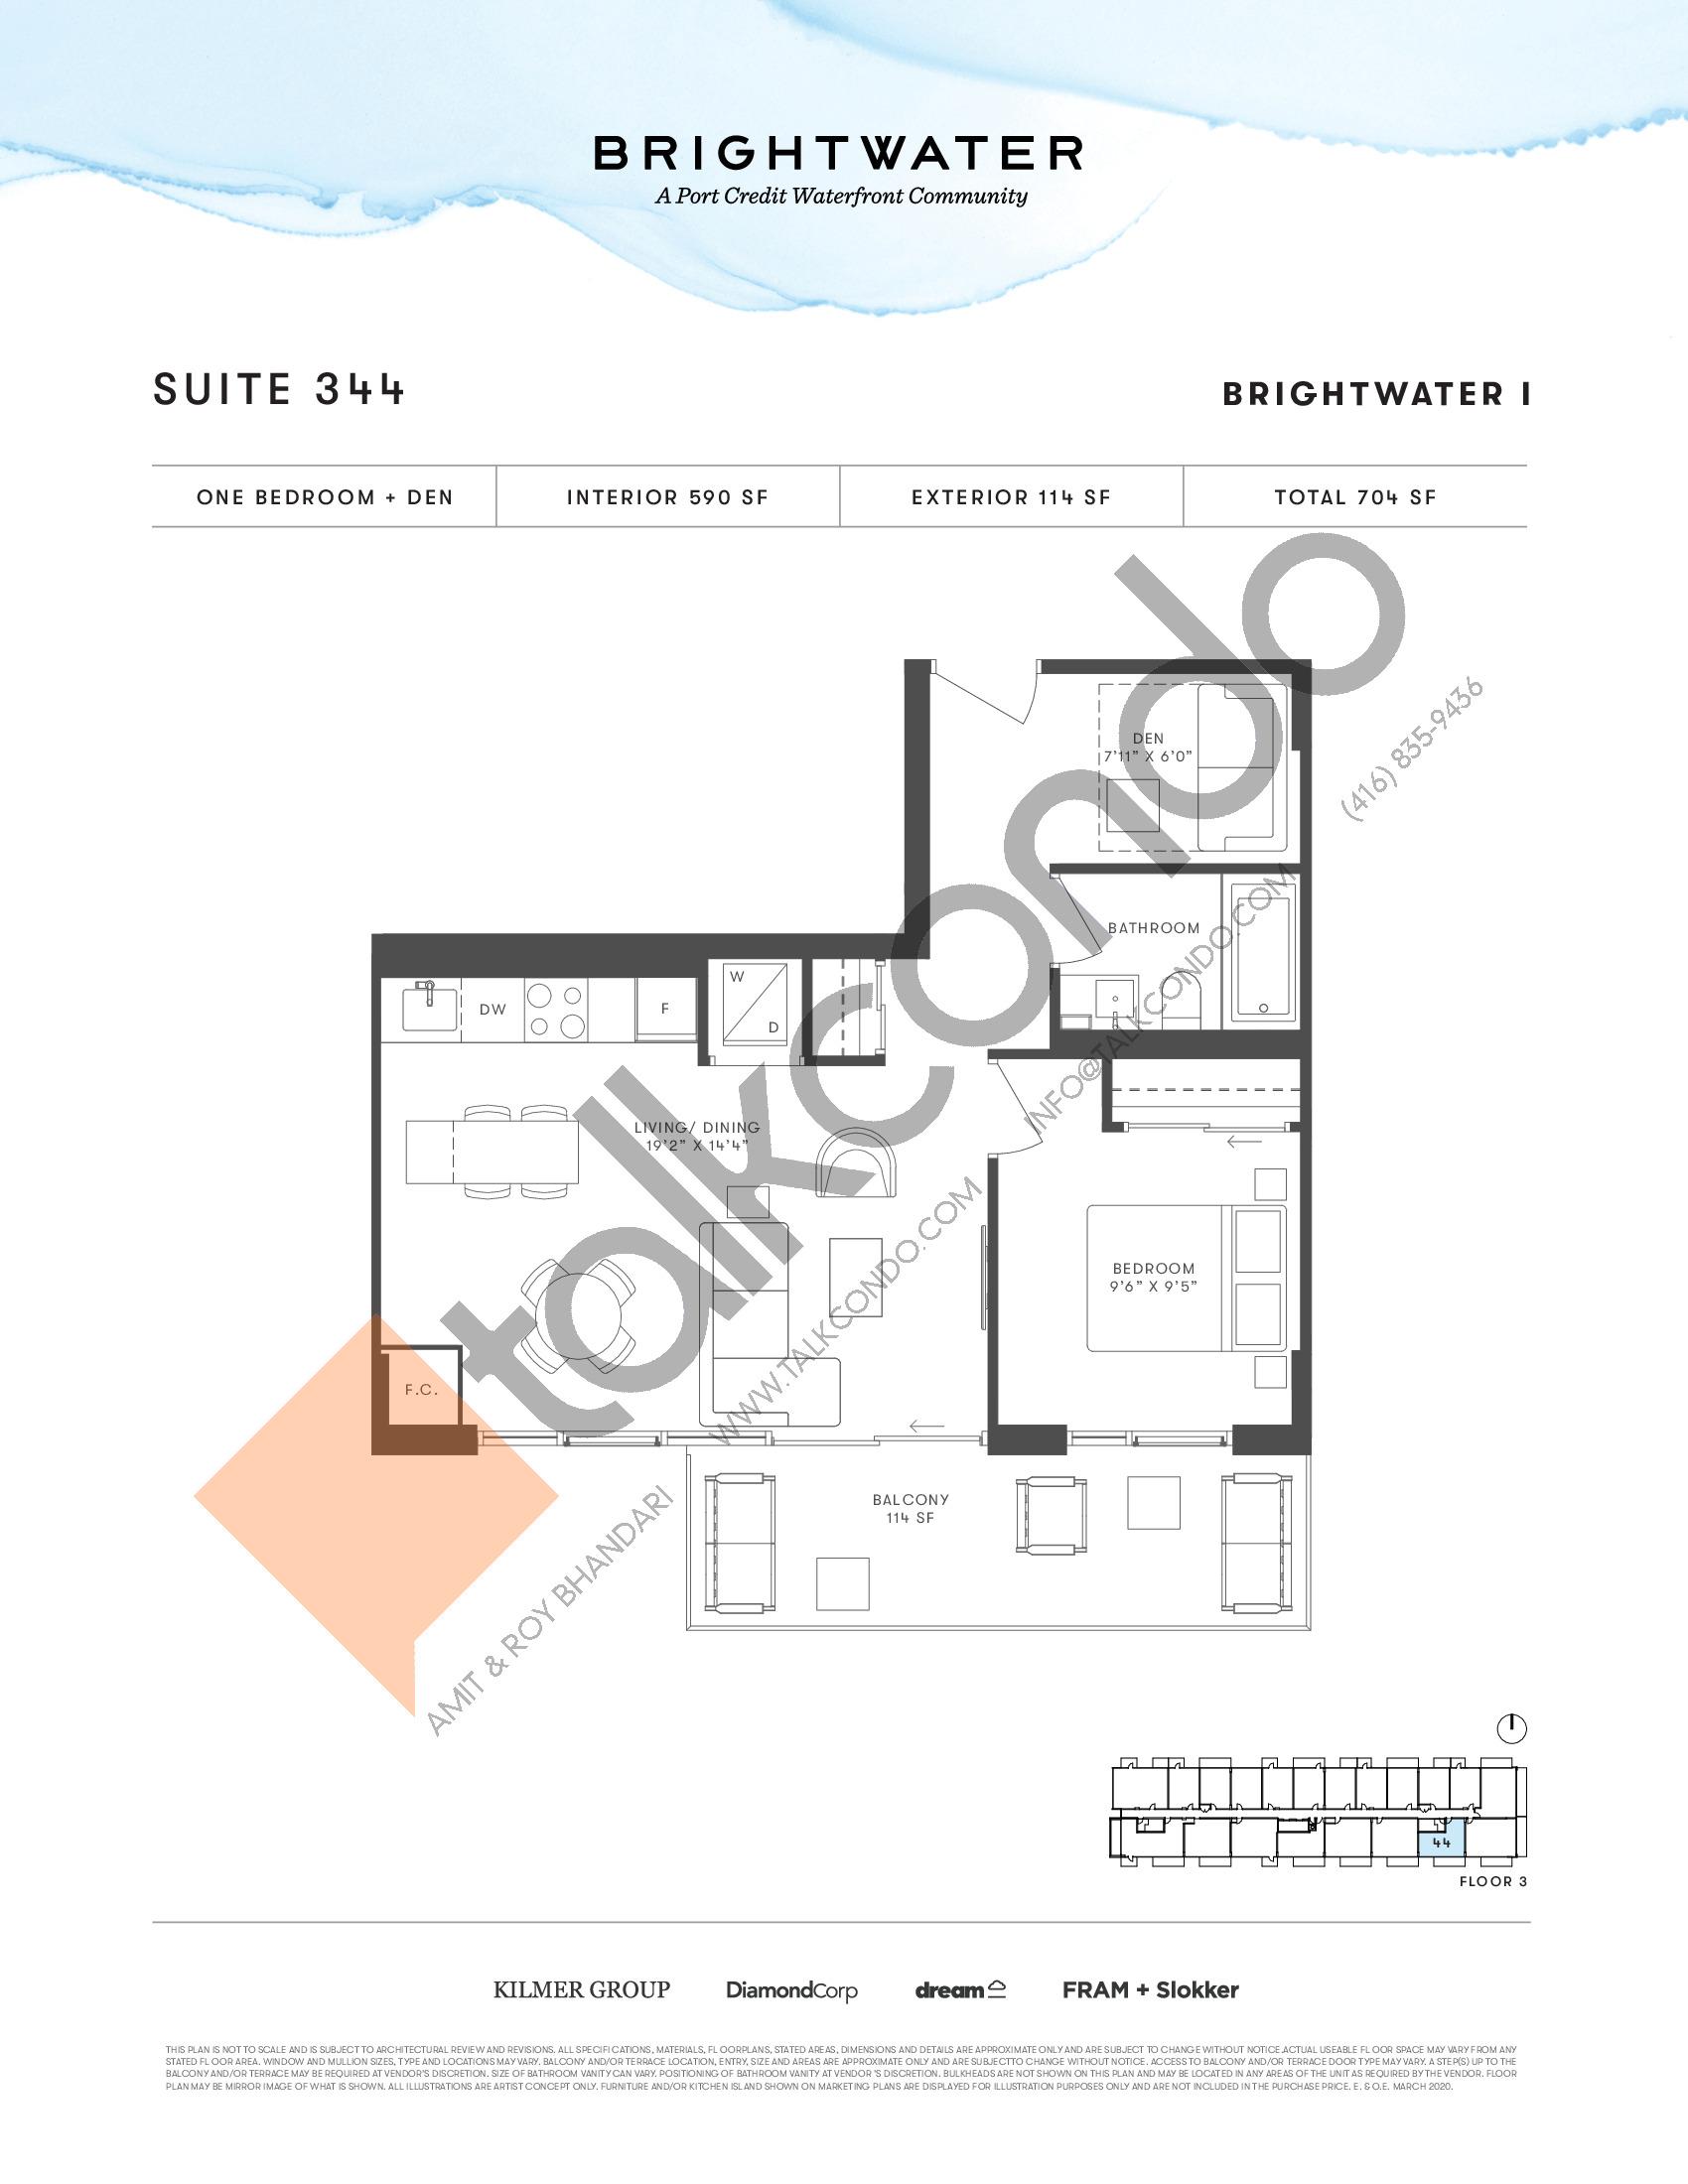 Suite 344 Floor Plan at Brightwater I Condos - 590 sq.ft